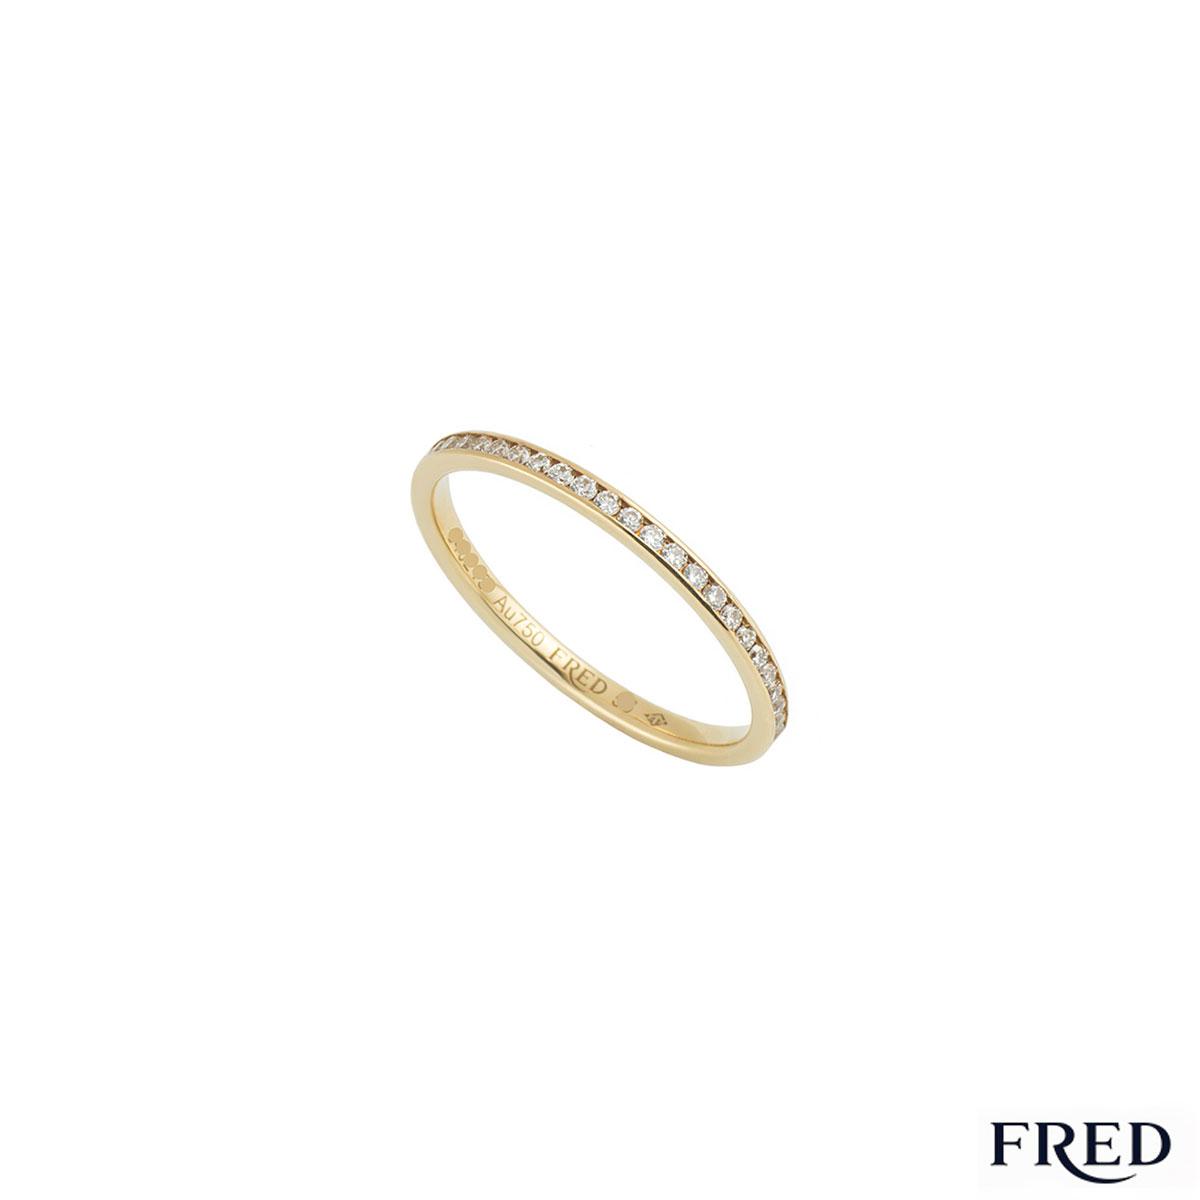 Fred Yellow Gold Full Diamond Eternity Ring 0.32ct G+/VS+